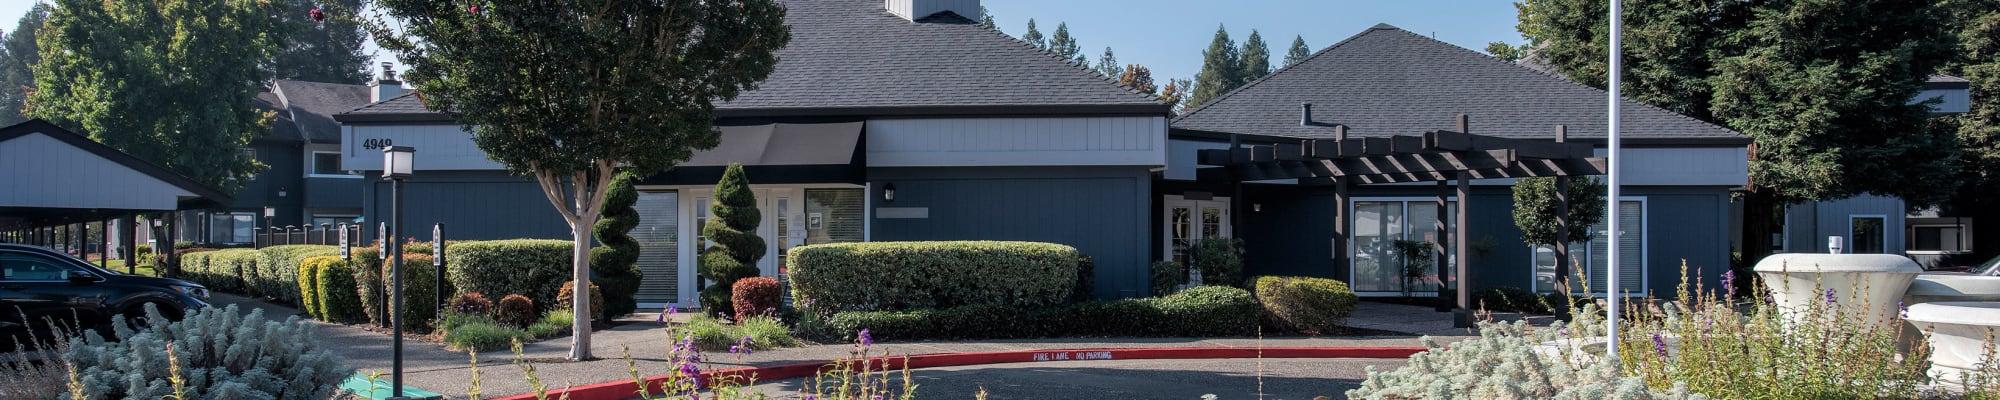 Photo gallery at Park Ridge Apartment Homes in Rohnert Park, California